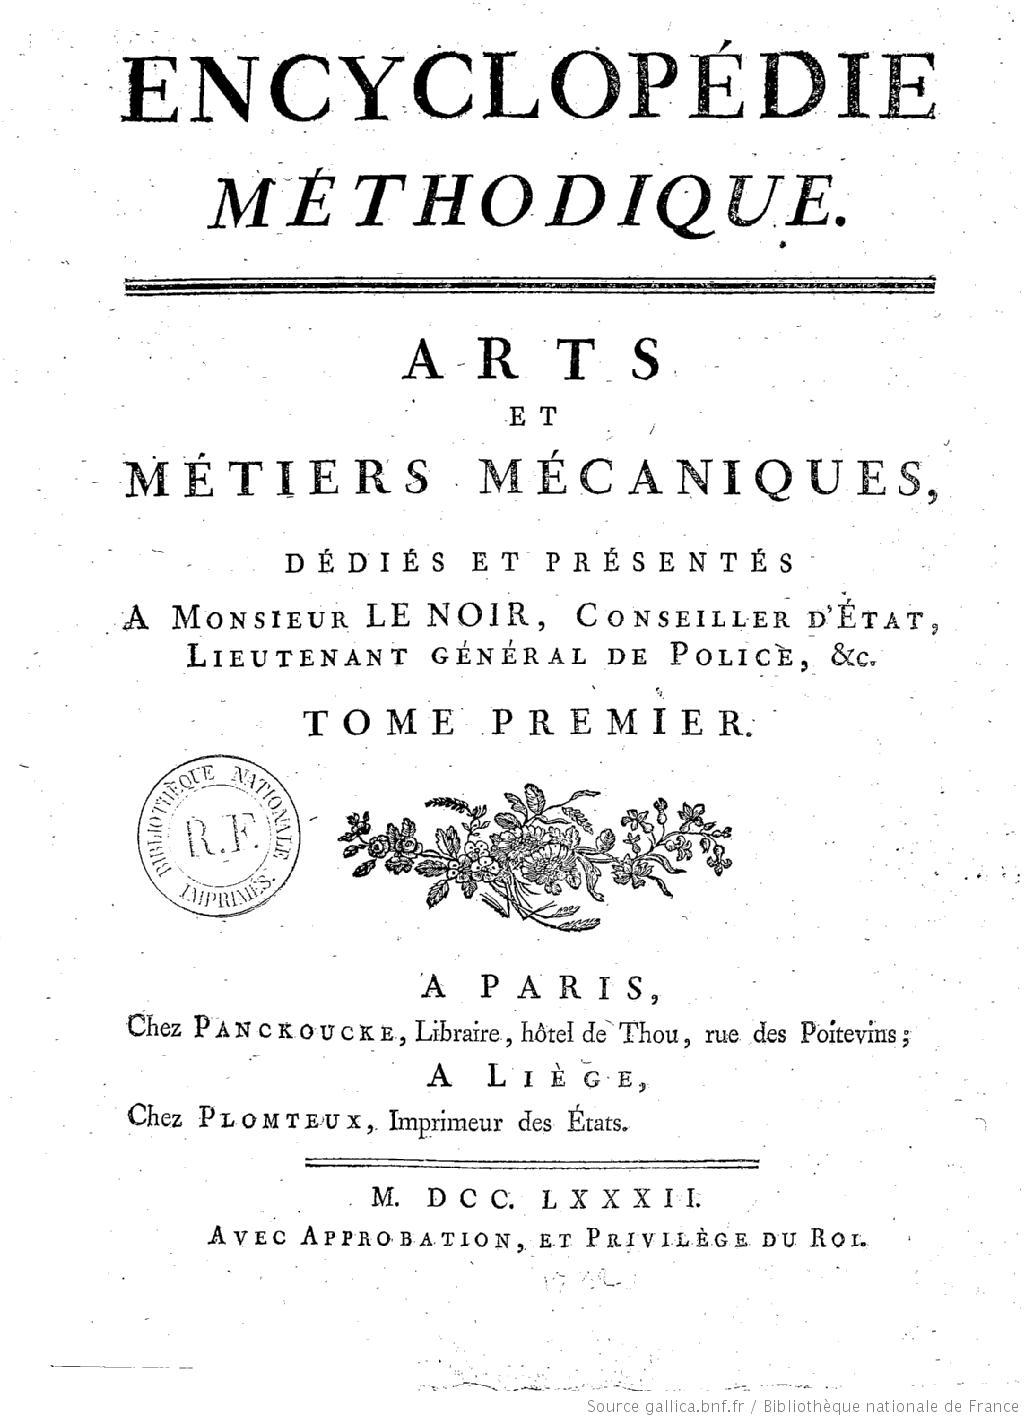 Encyclopedie Methodique Wikipedia